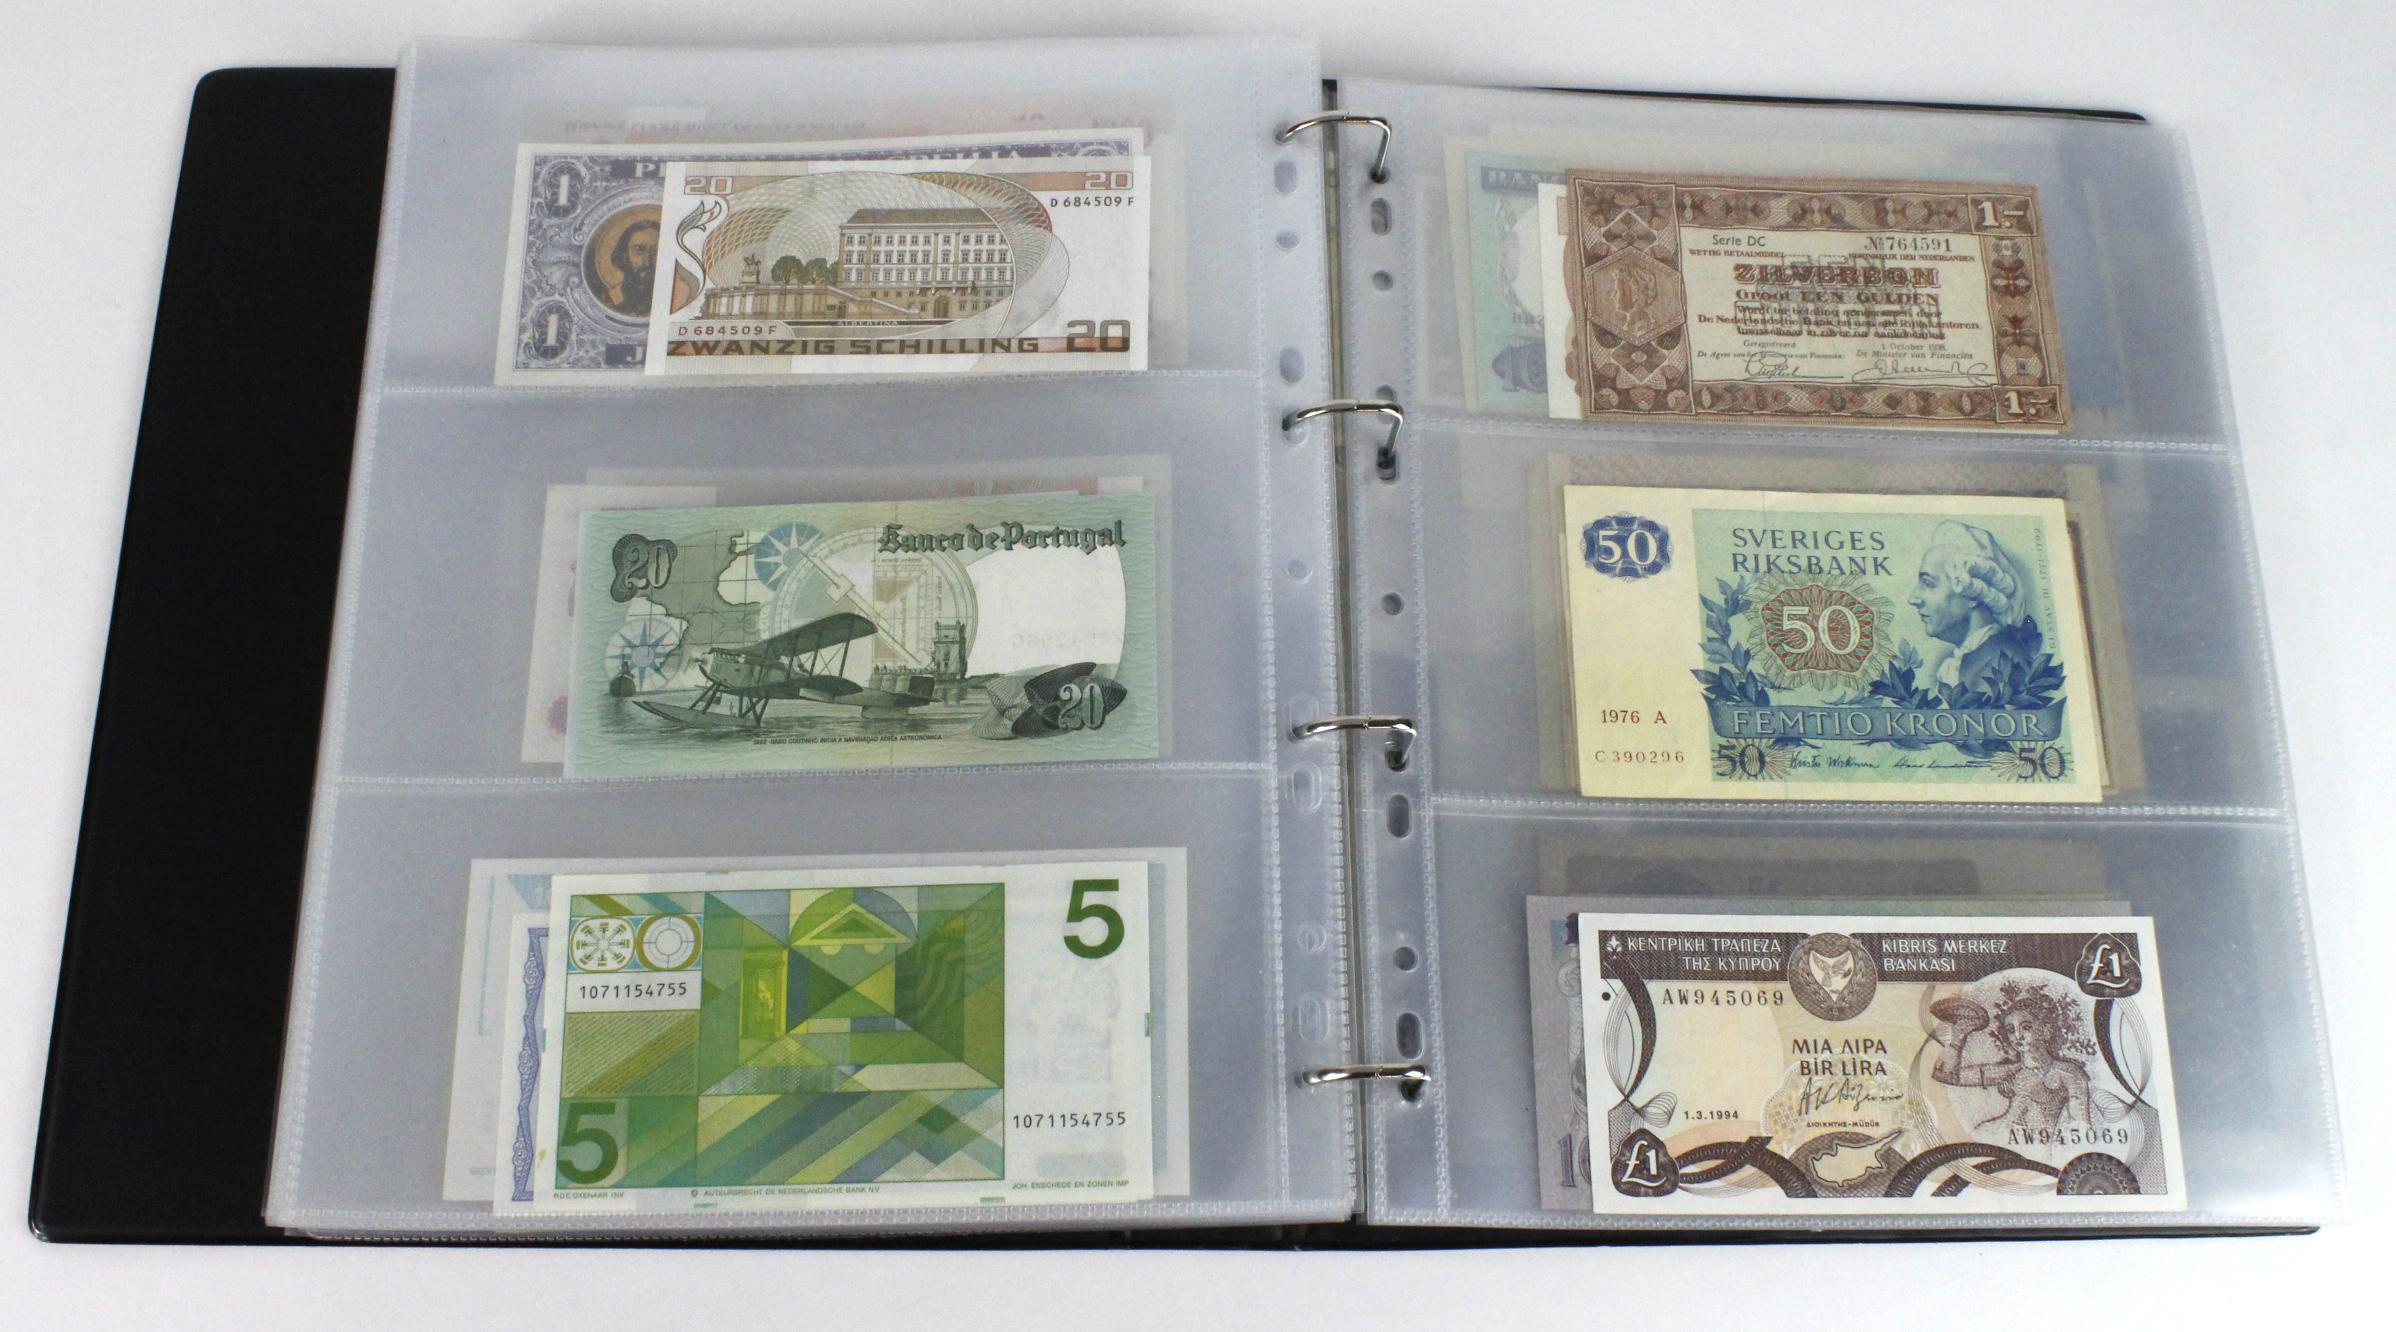 World (163), in banknote album including Bahamas, Spain, Sweden, Netherlands, Algeria, Macau, - Image 46 of 57